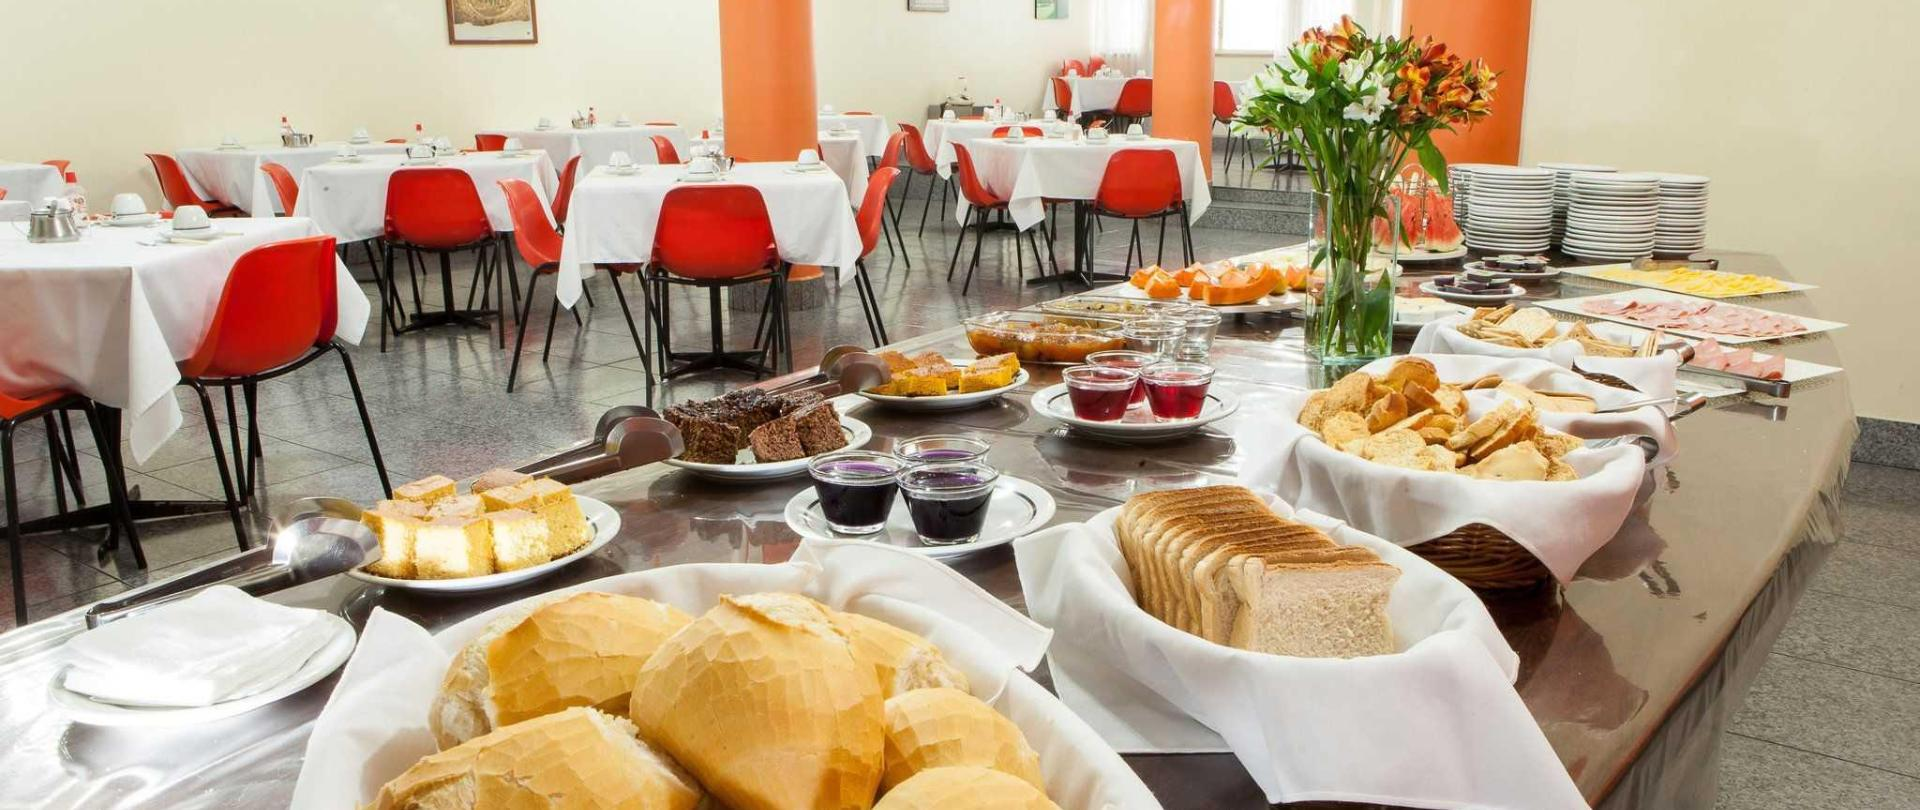 domus-hotel-buffet-caf-da-manh-centro-s-o-paulo-2.JPG